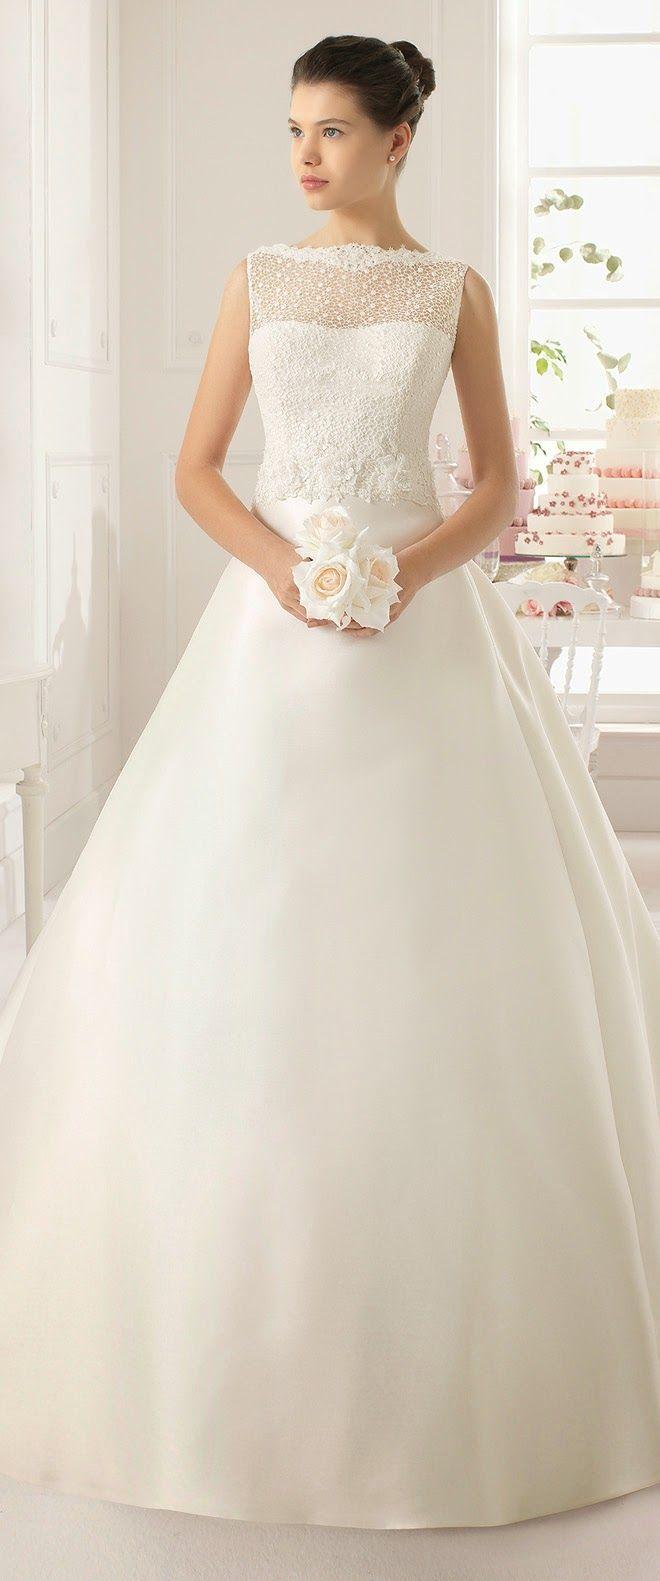 Wedding-Dresses-0545